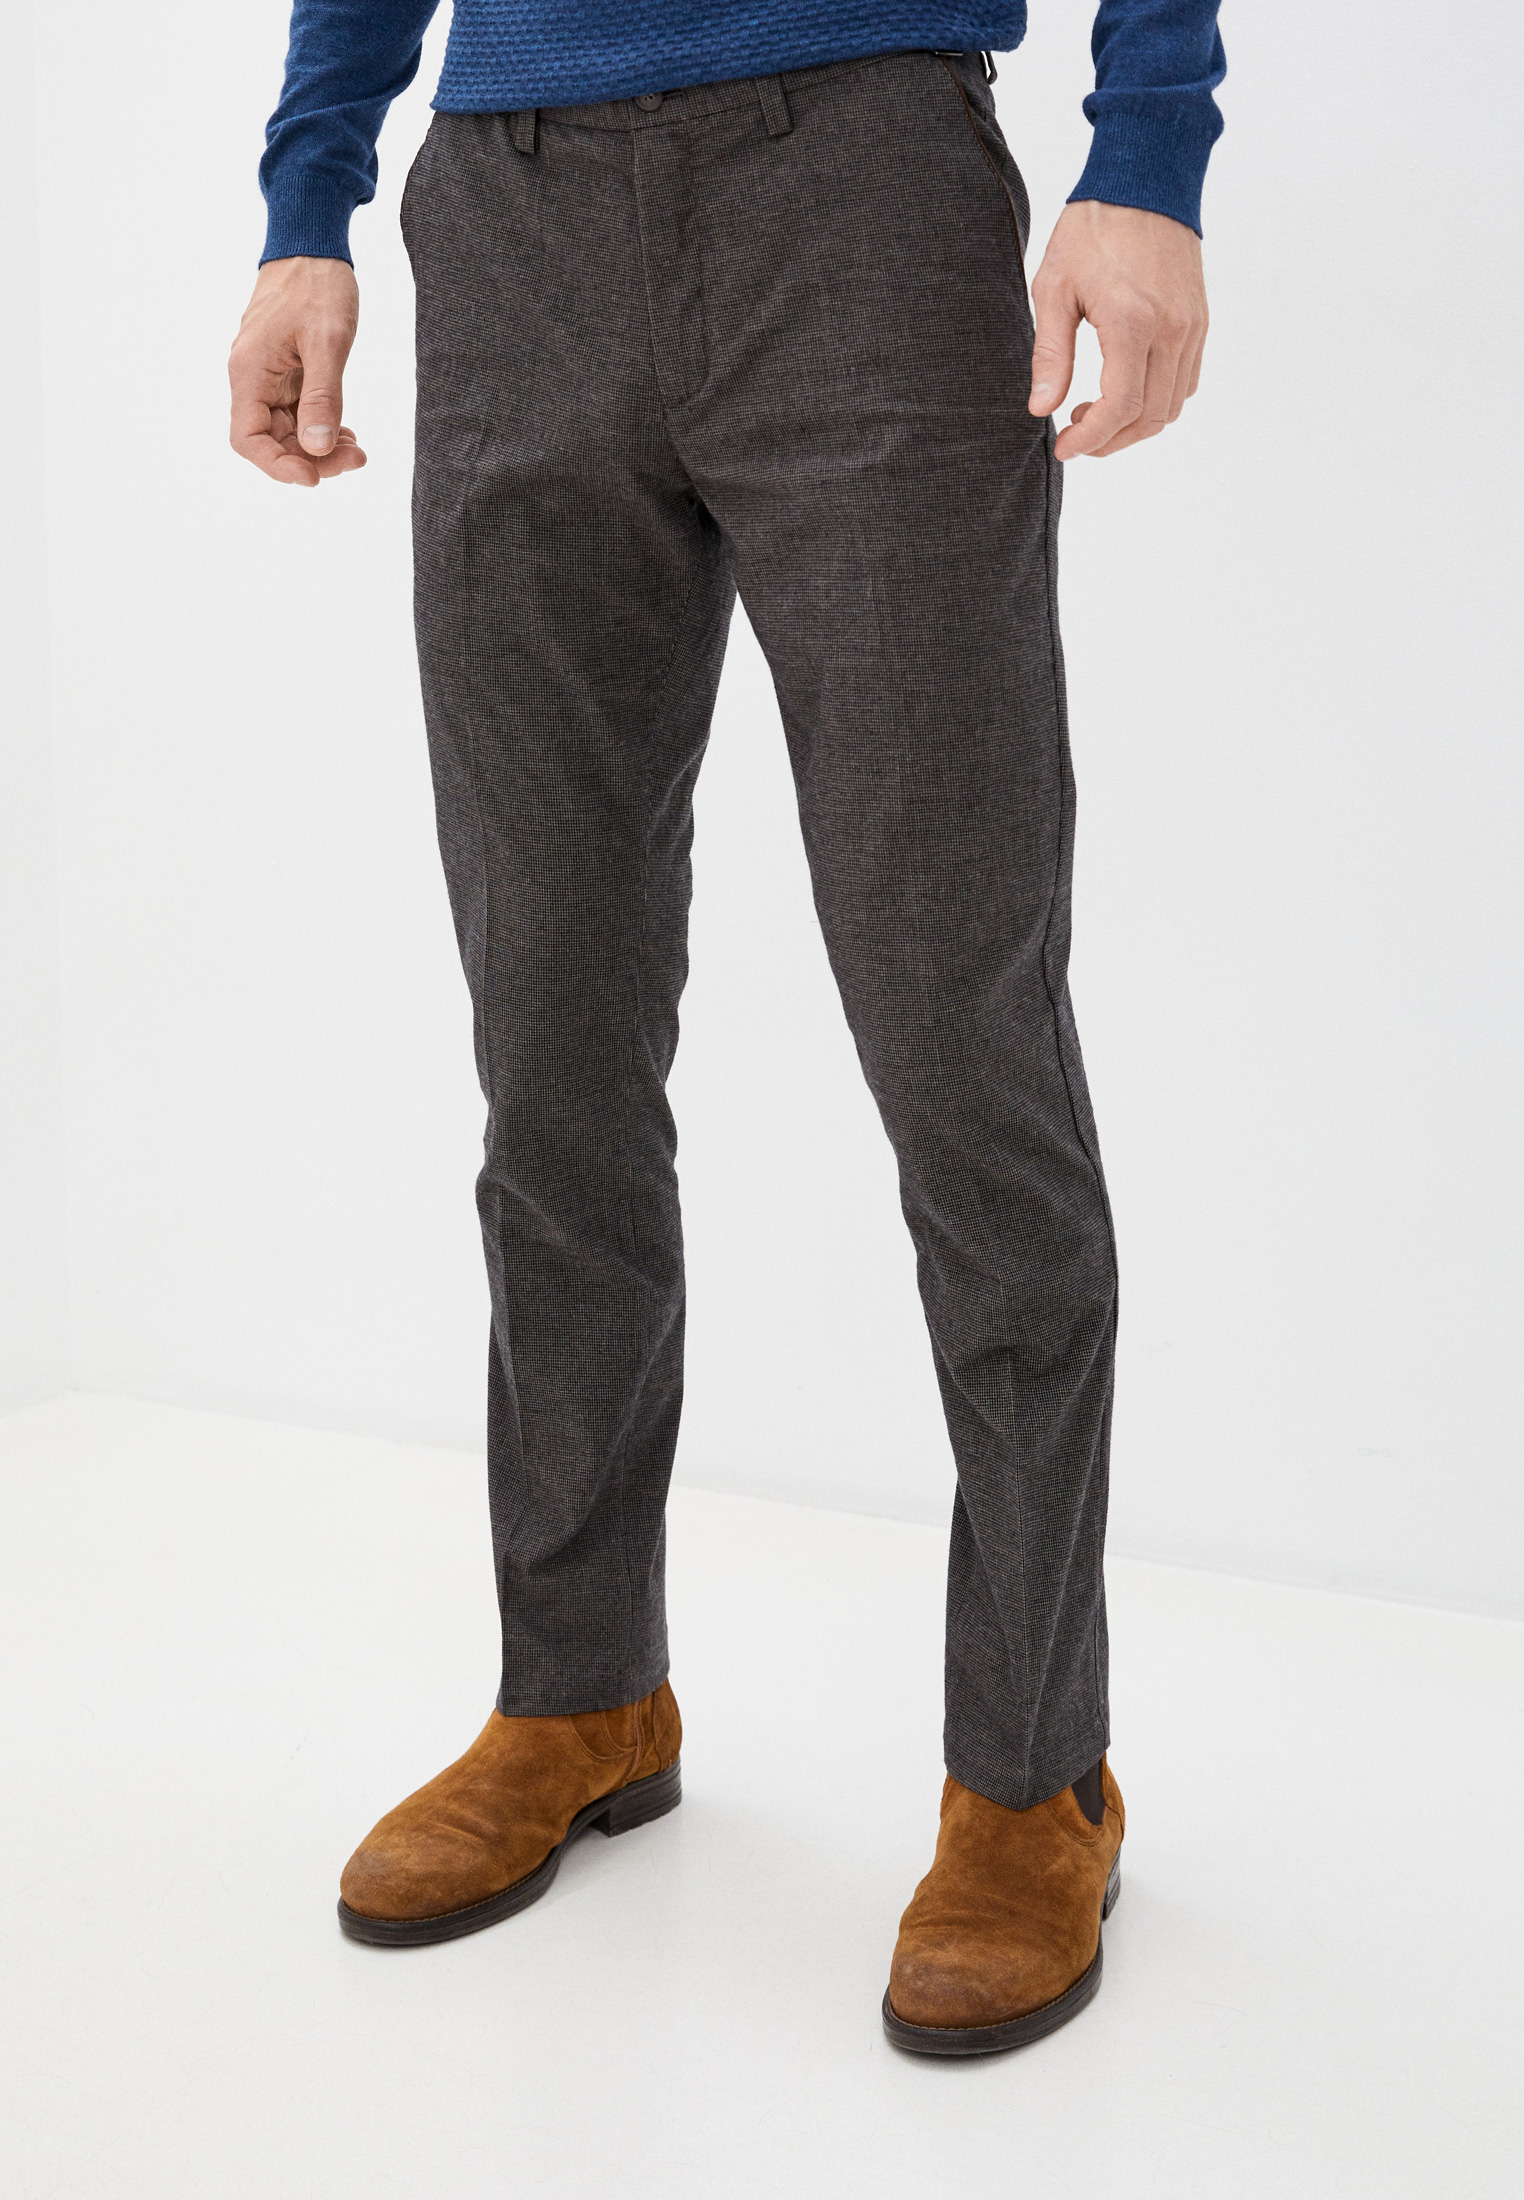 Мужские зауженные брюки Zolla 10337323173